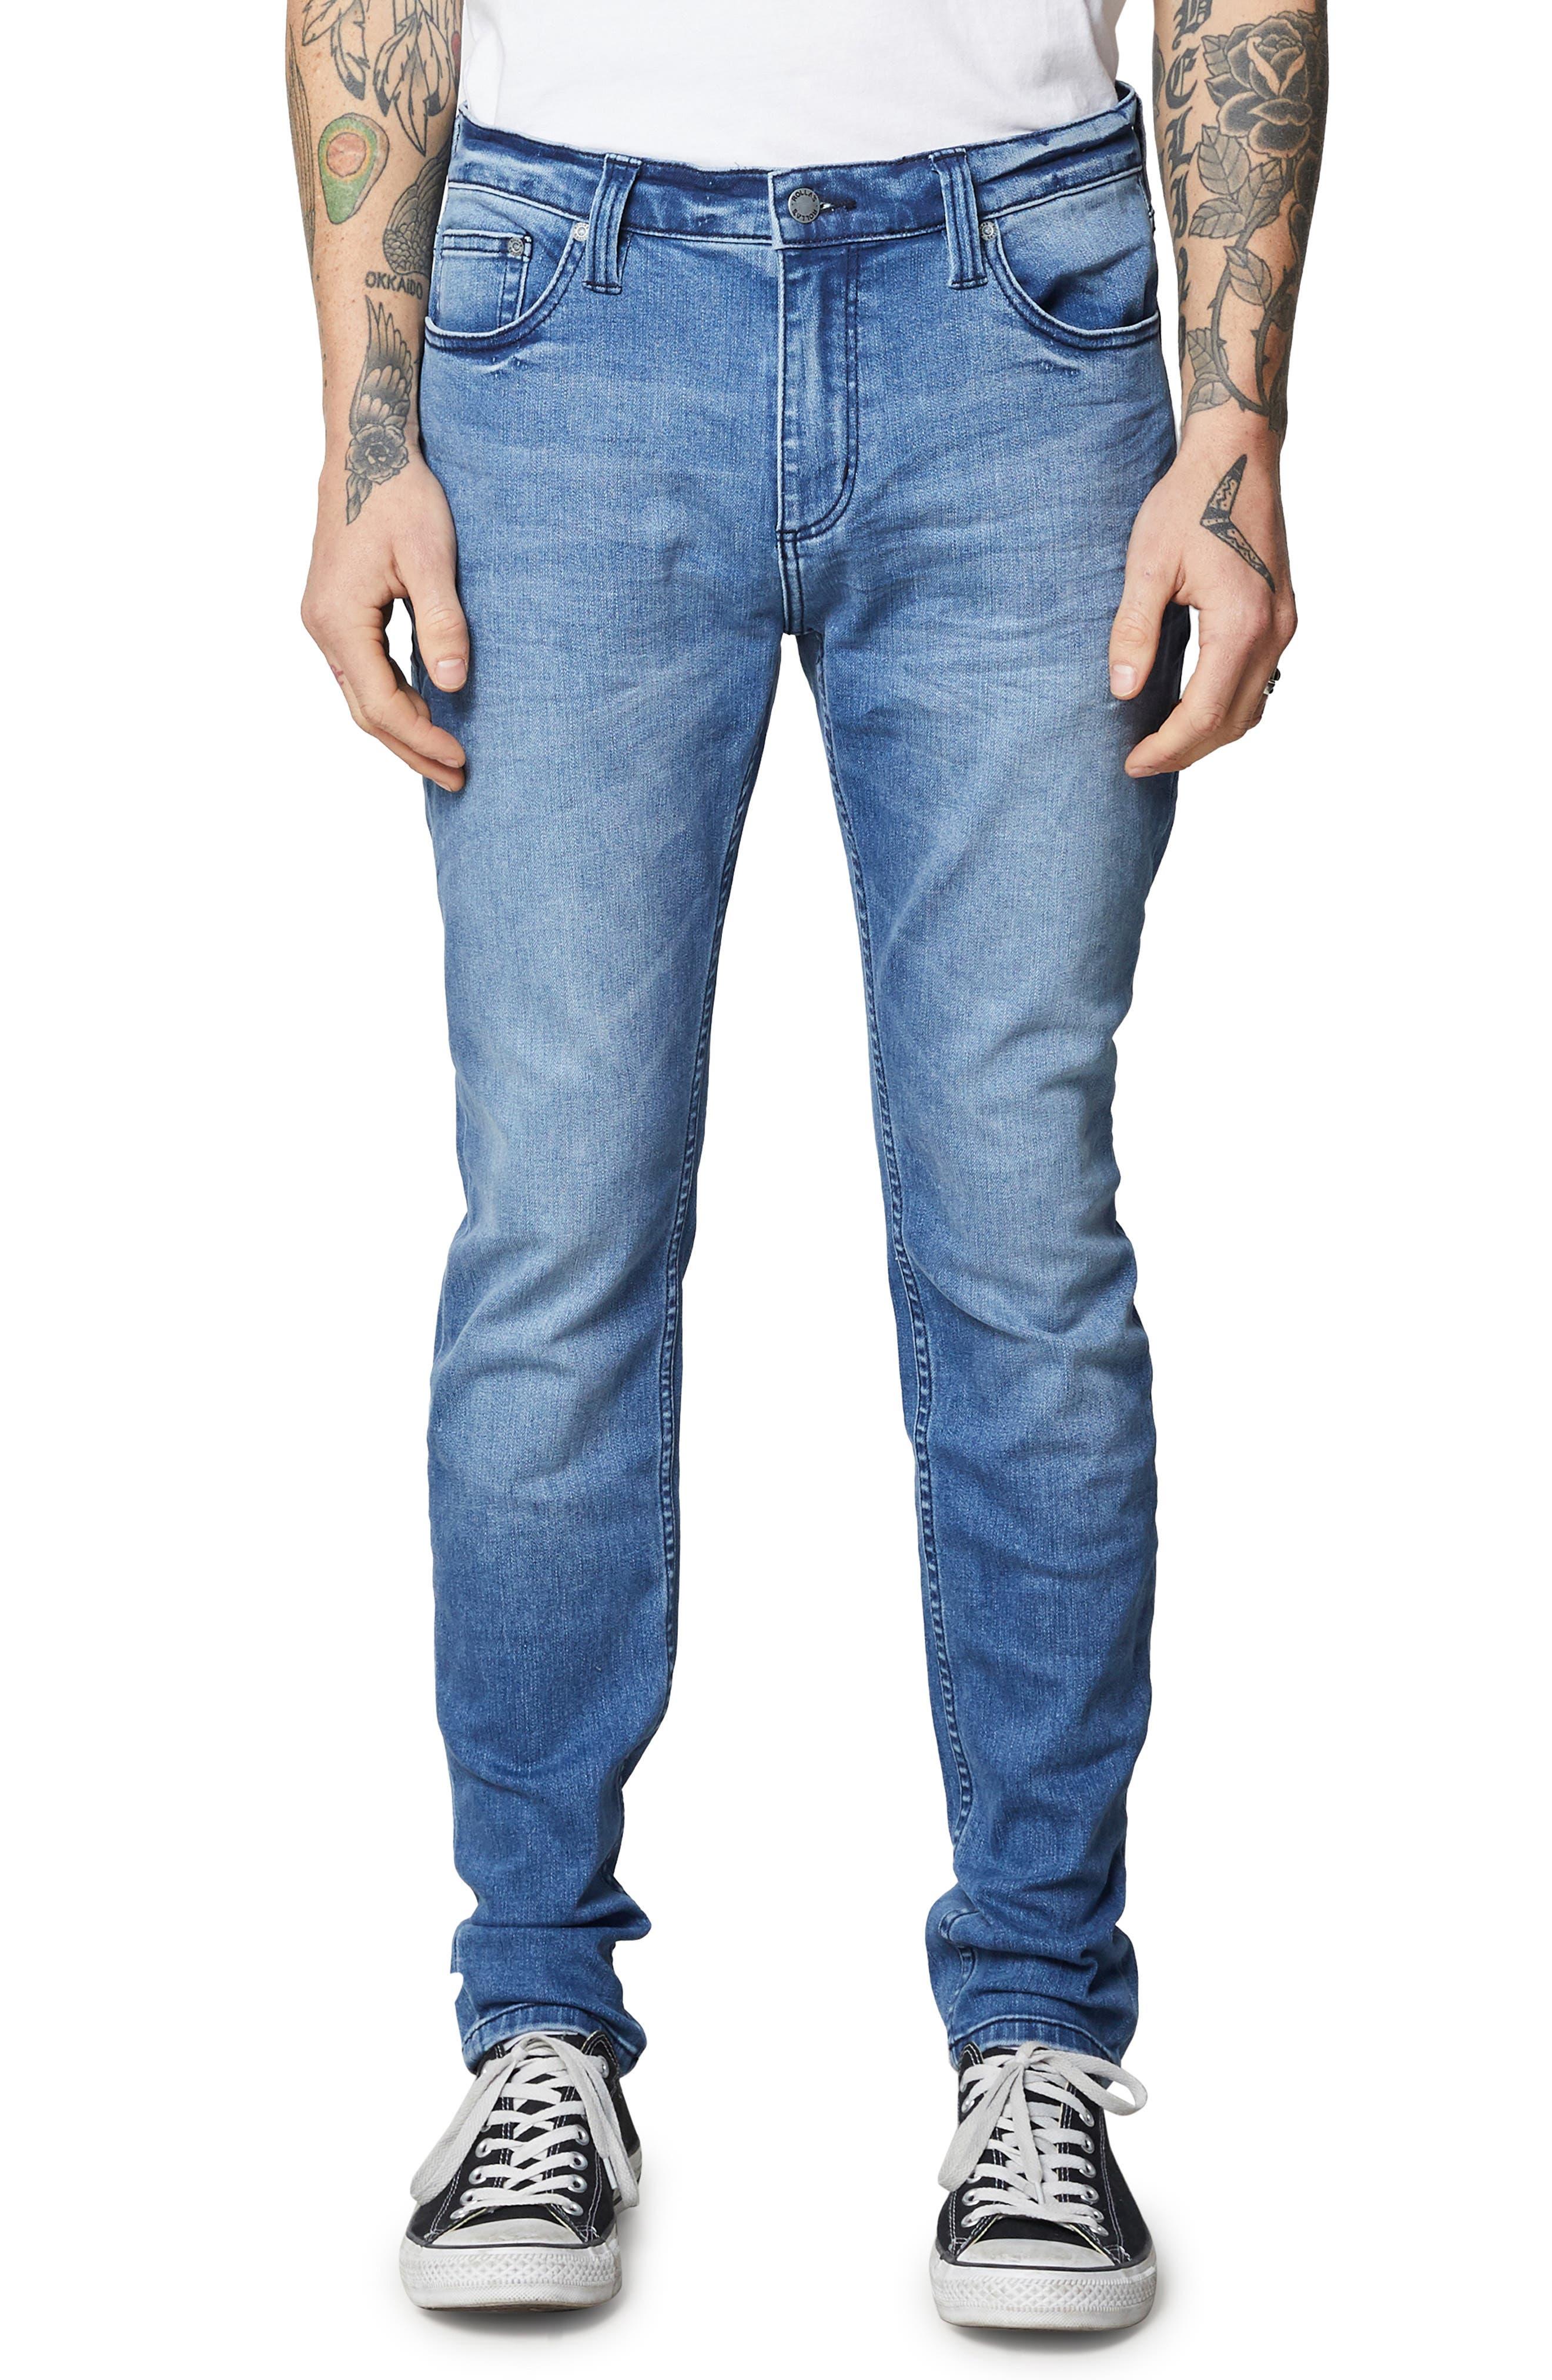 Stinger Skinny Fit Jeans,                             Main thumbnail 1, color,                             TRUE BLUE